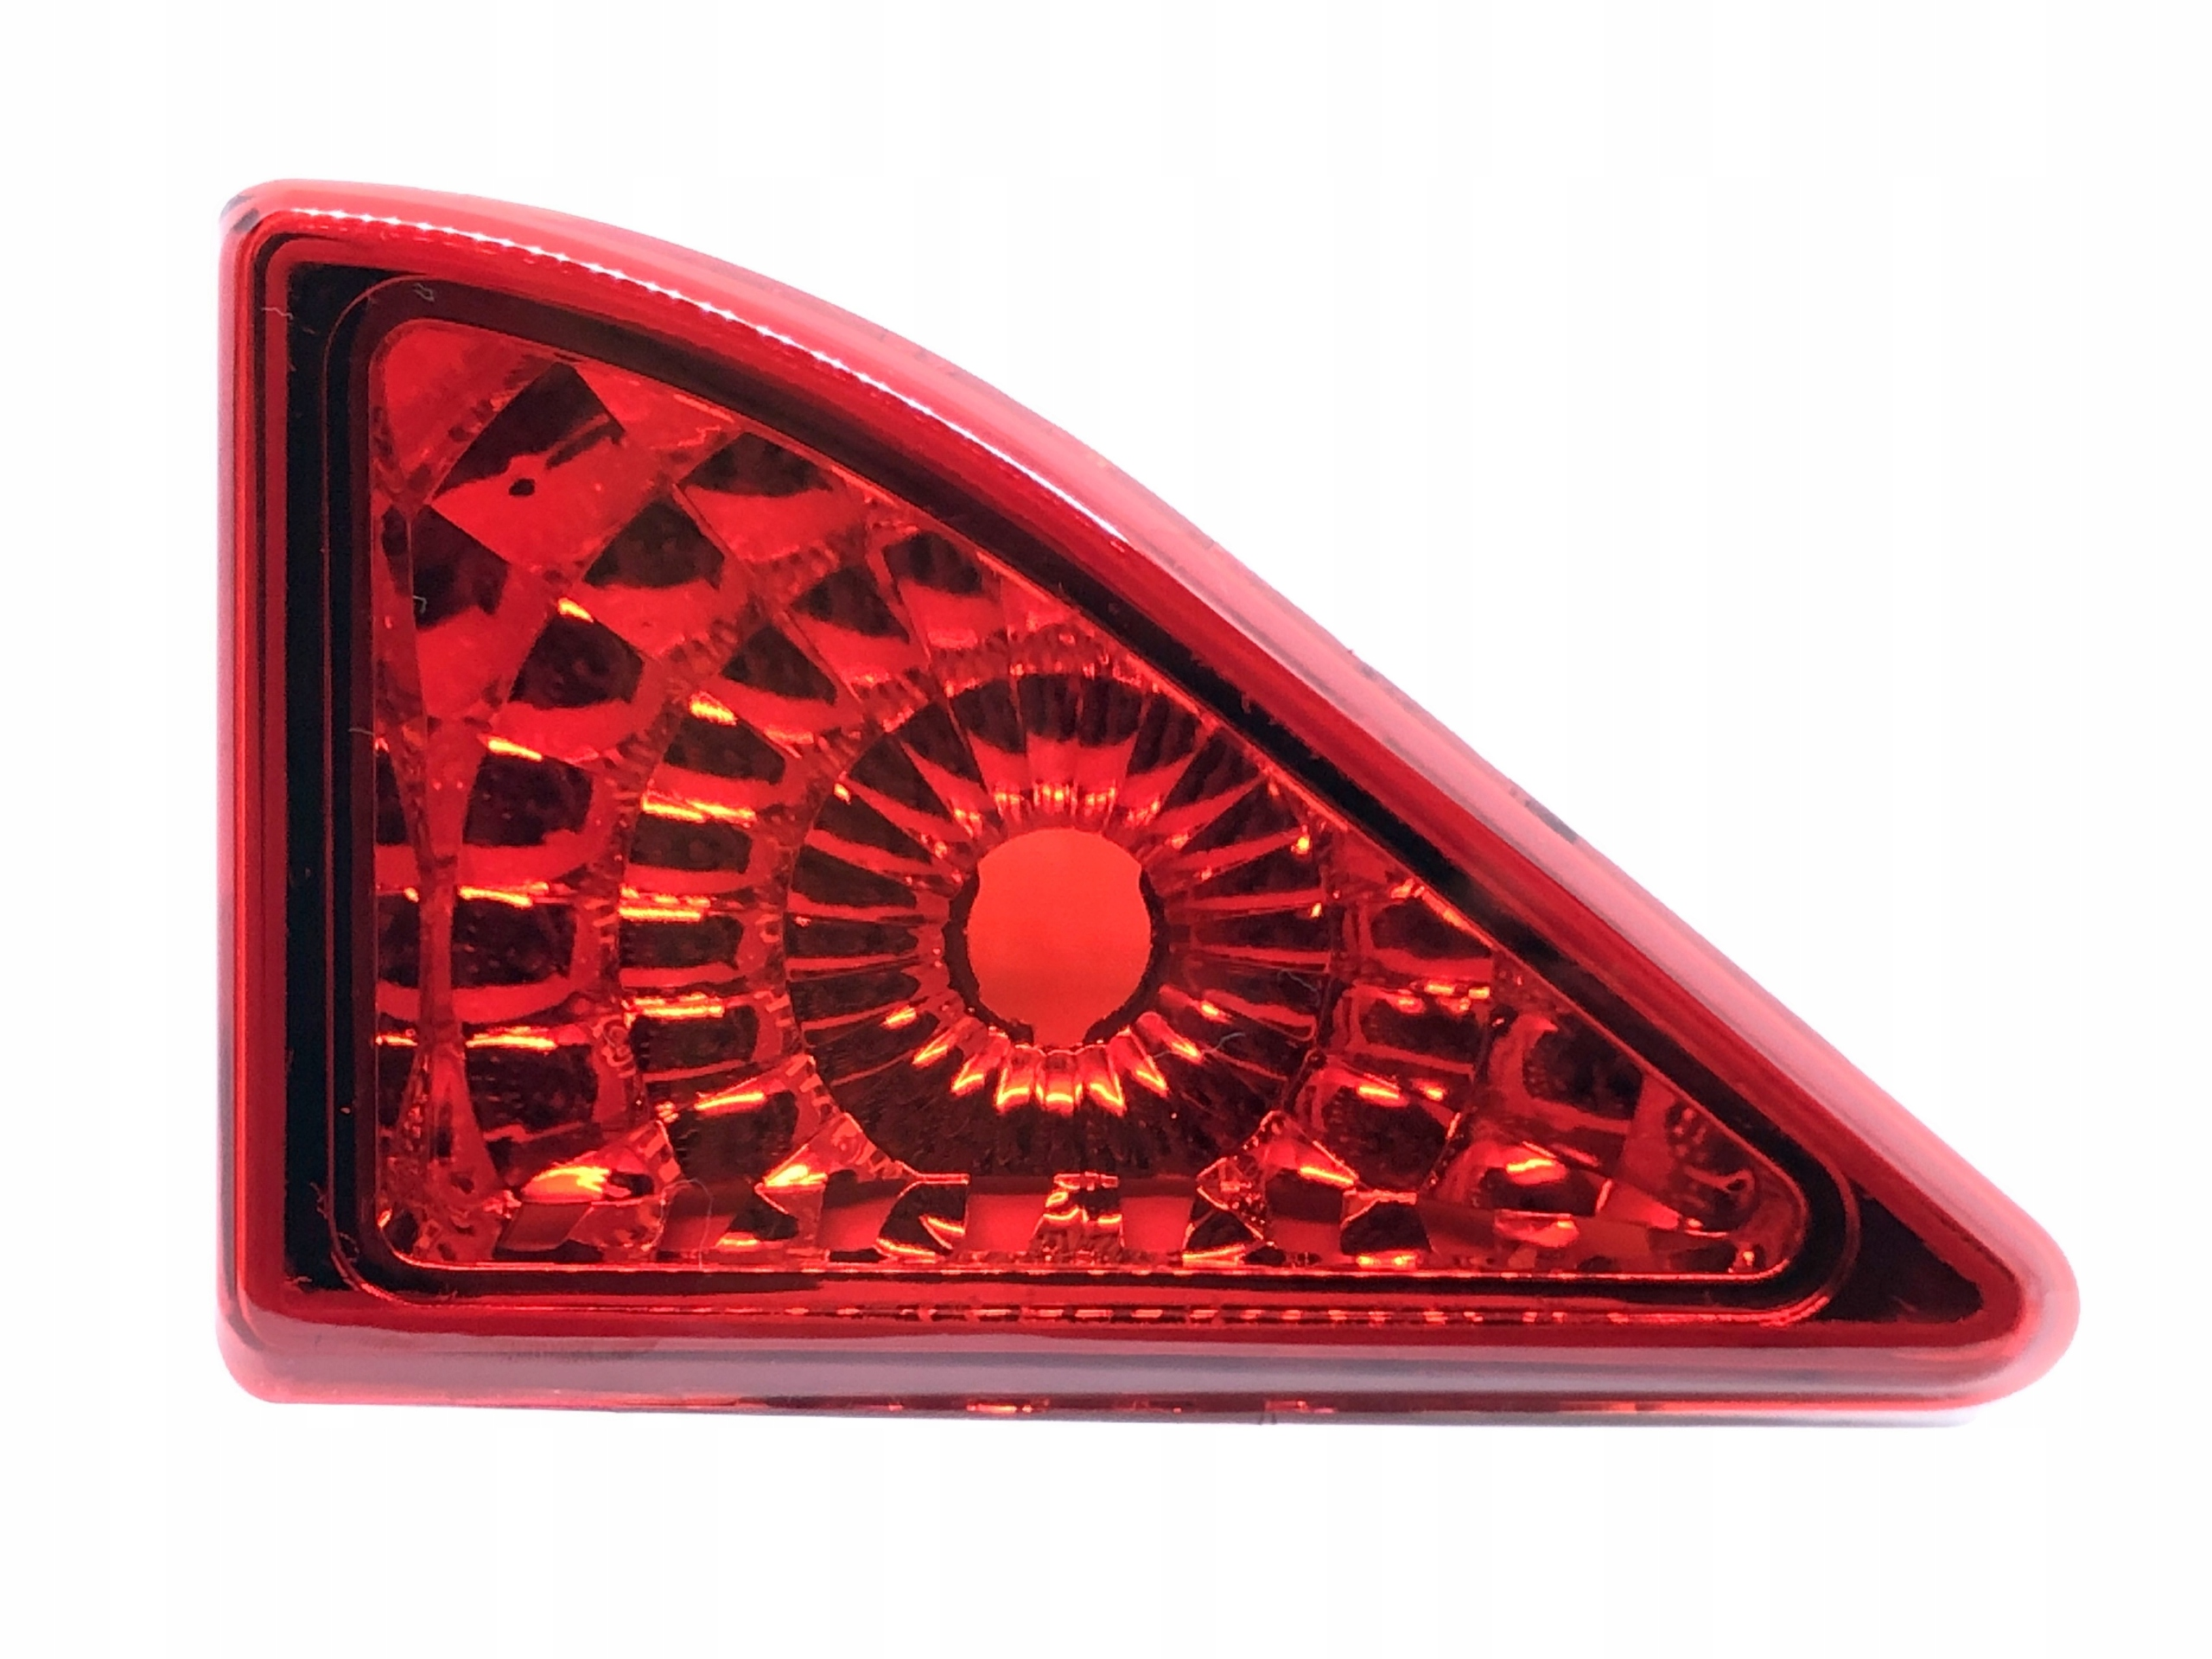 лампа Свет сплава третий стоп master 3 movano